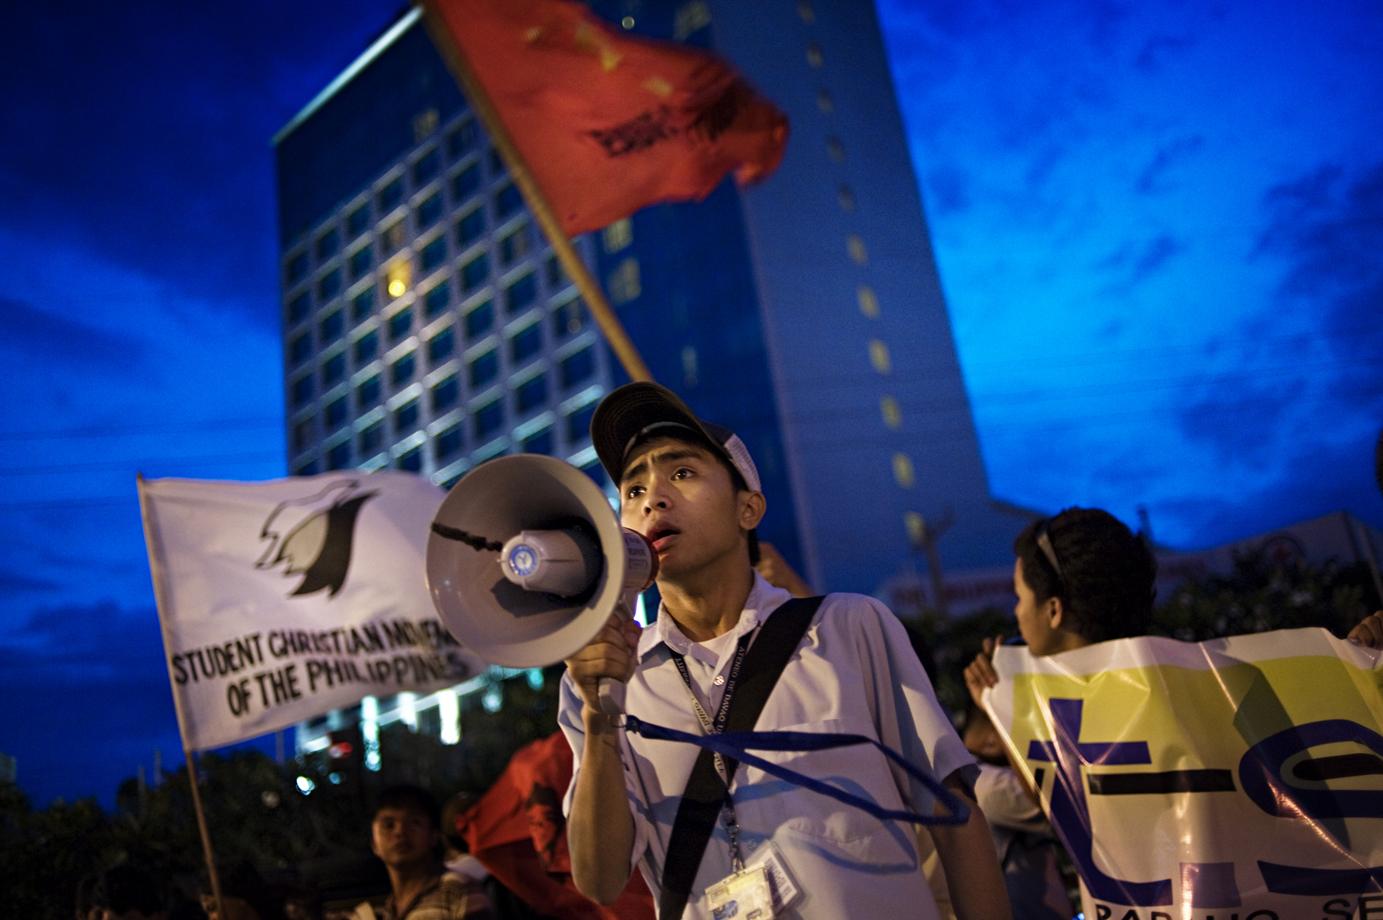 Students protests against the mayor of Davao city, Rodrigo Duterte, Mindanao / Philippines - 2010